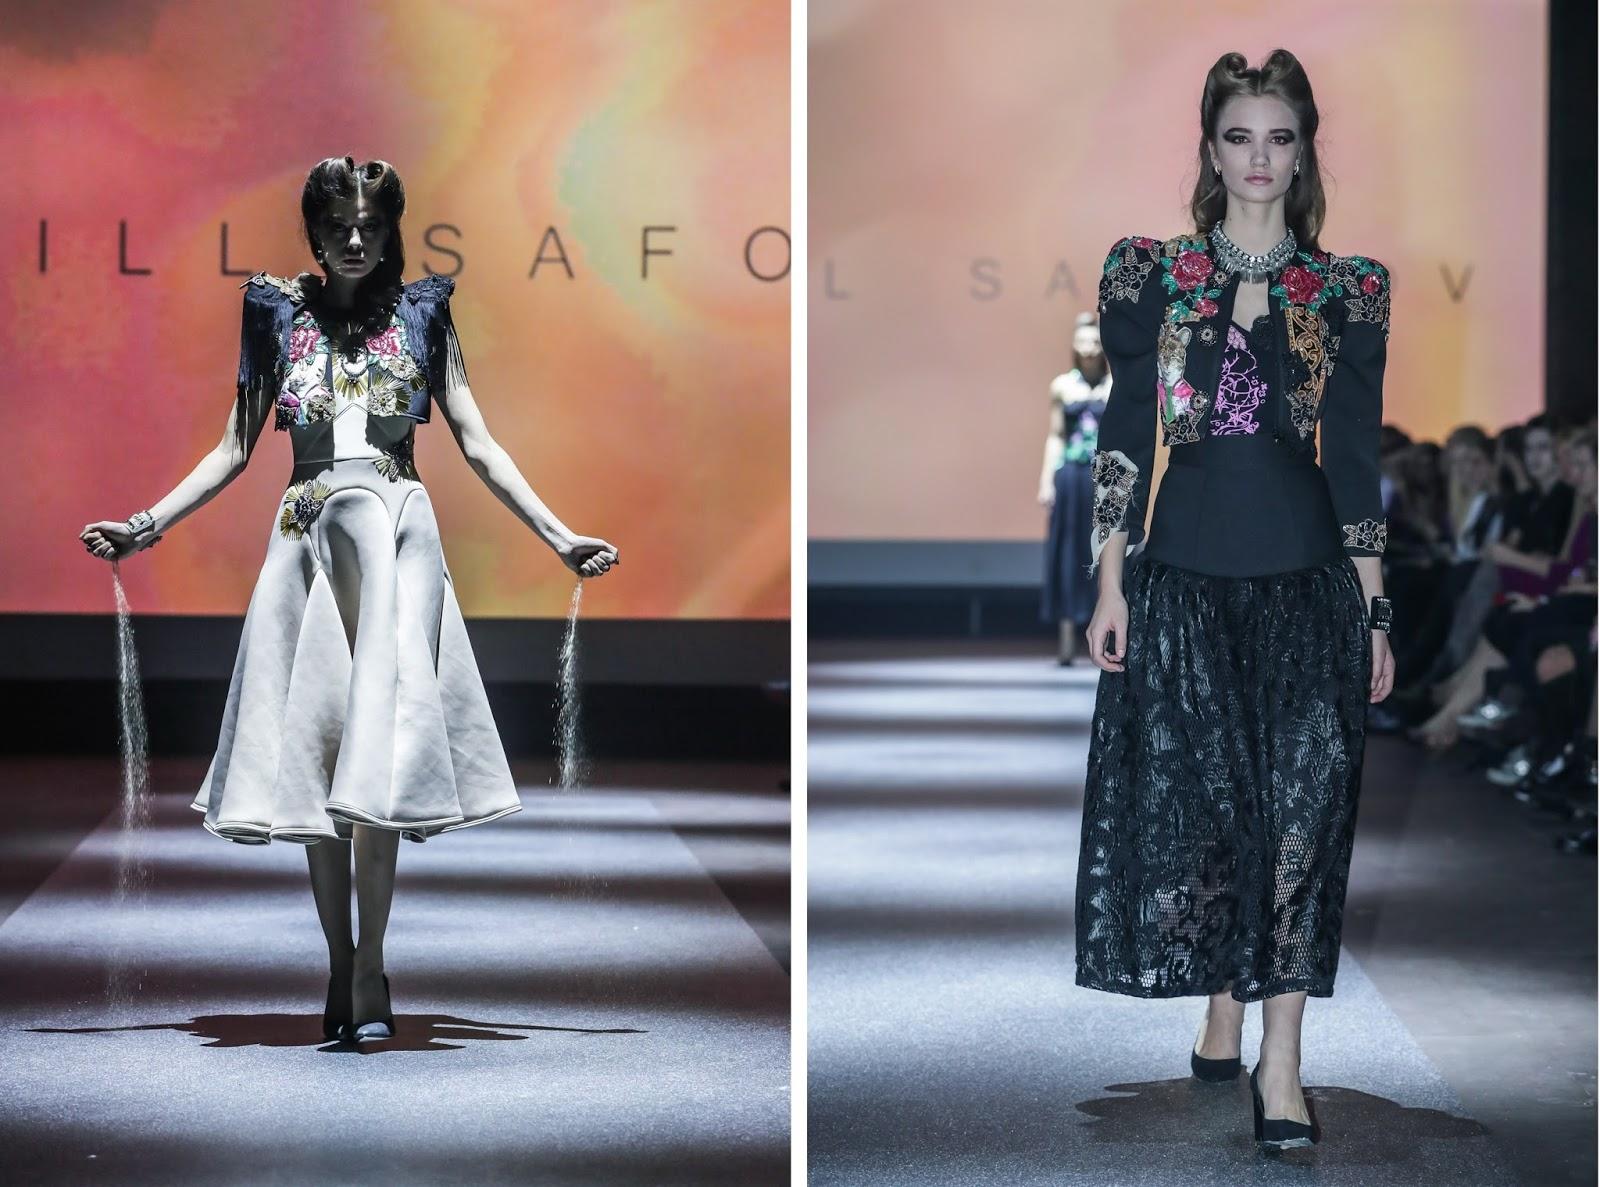 tallinn fashion week 2016 kirill safonov